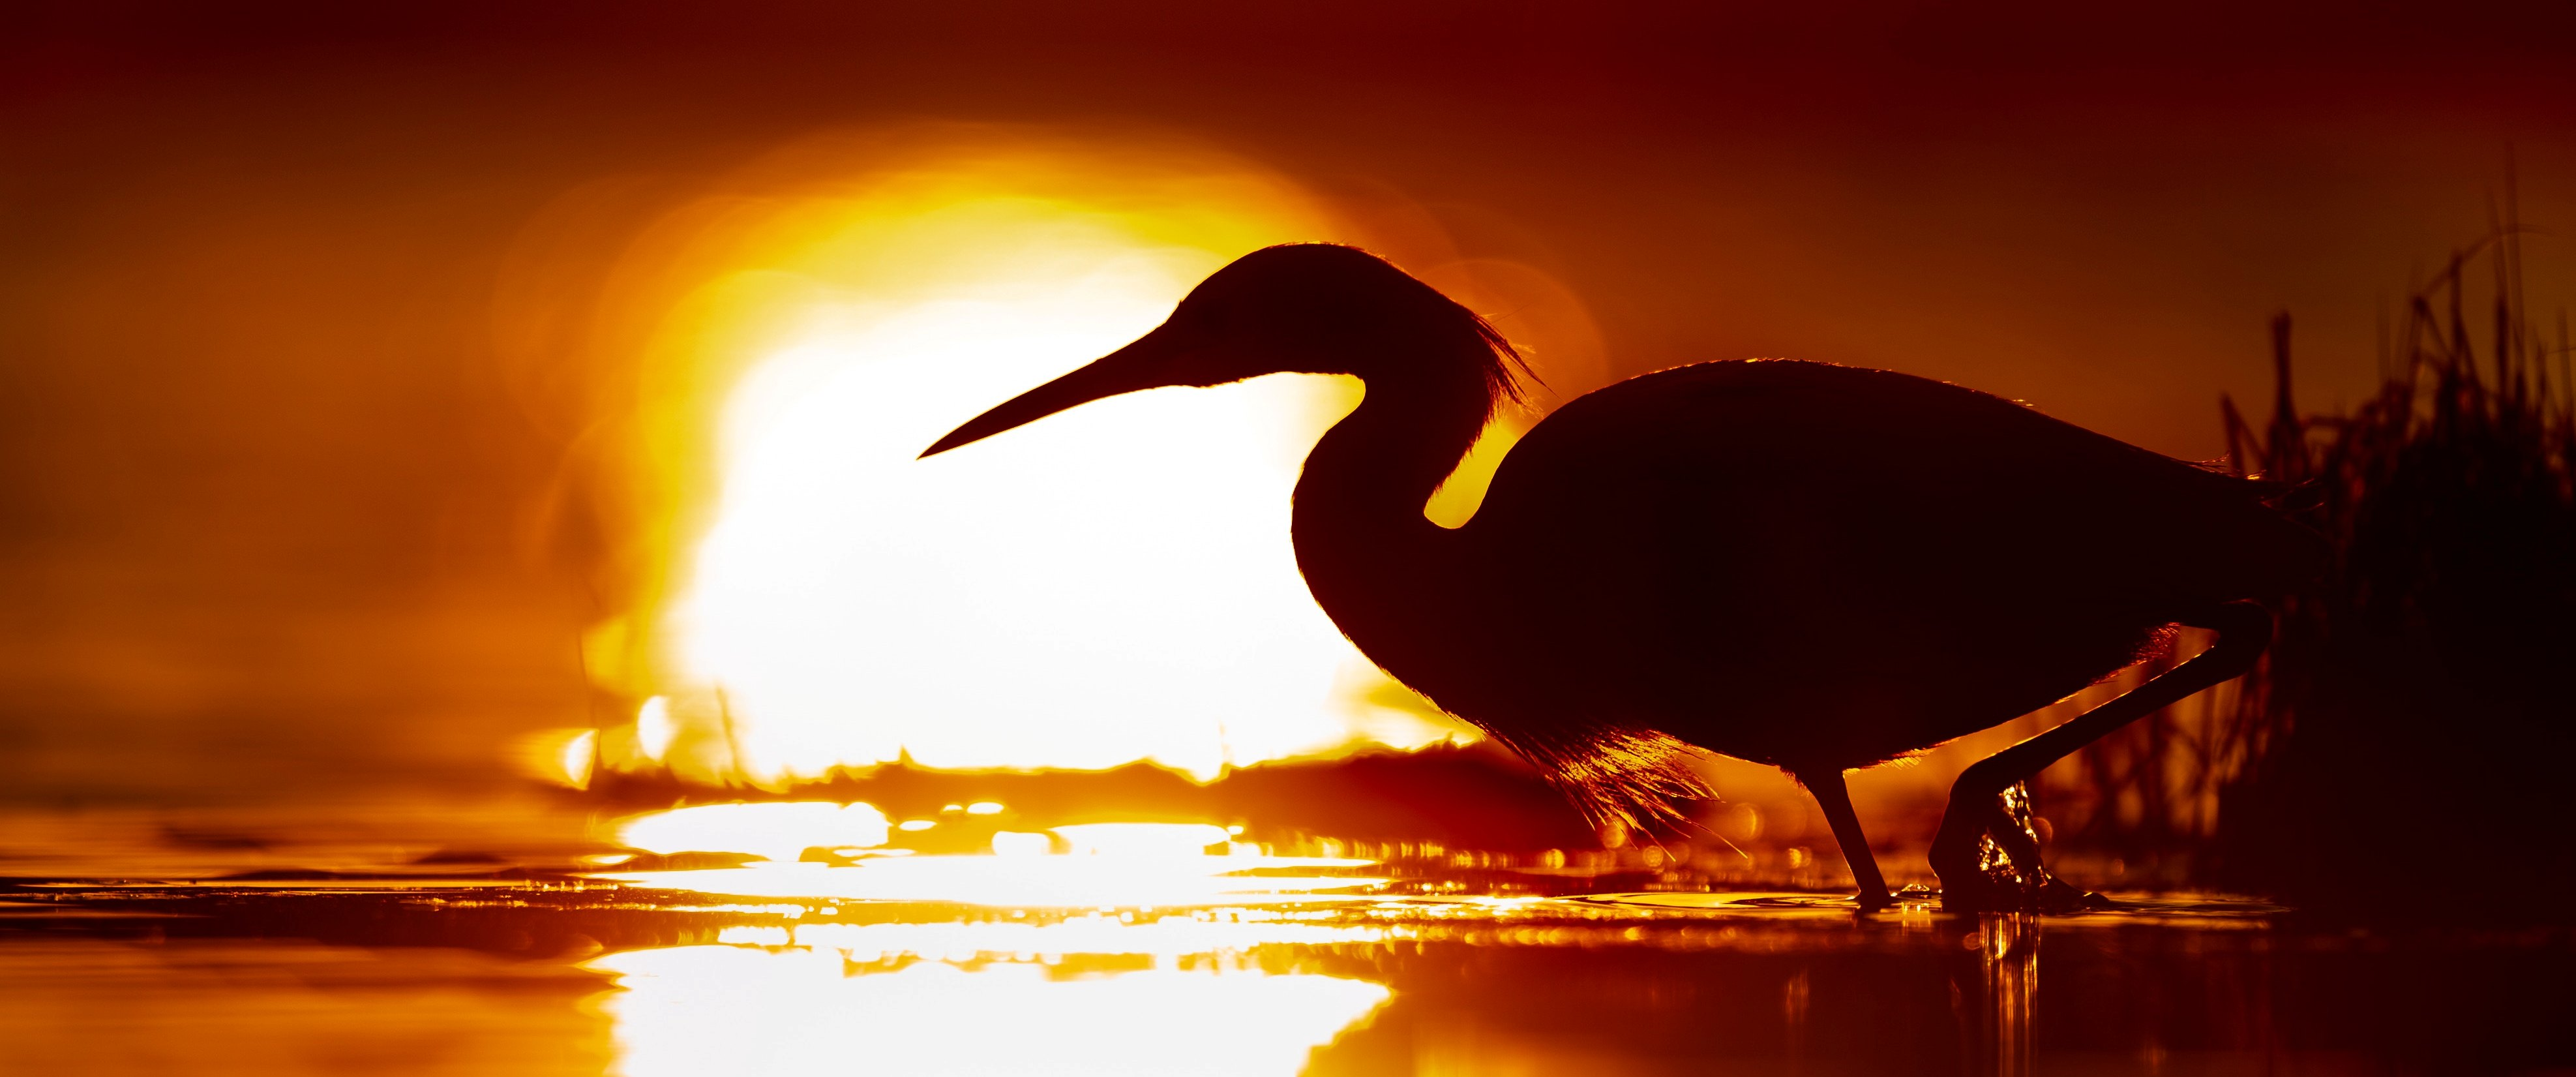 early bird banner - ray-hennessy-723278-unsplash.jpg